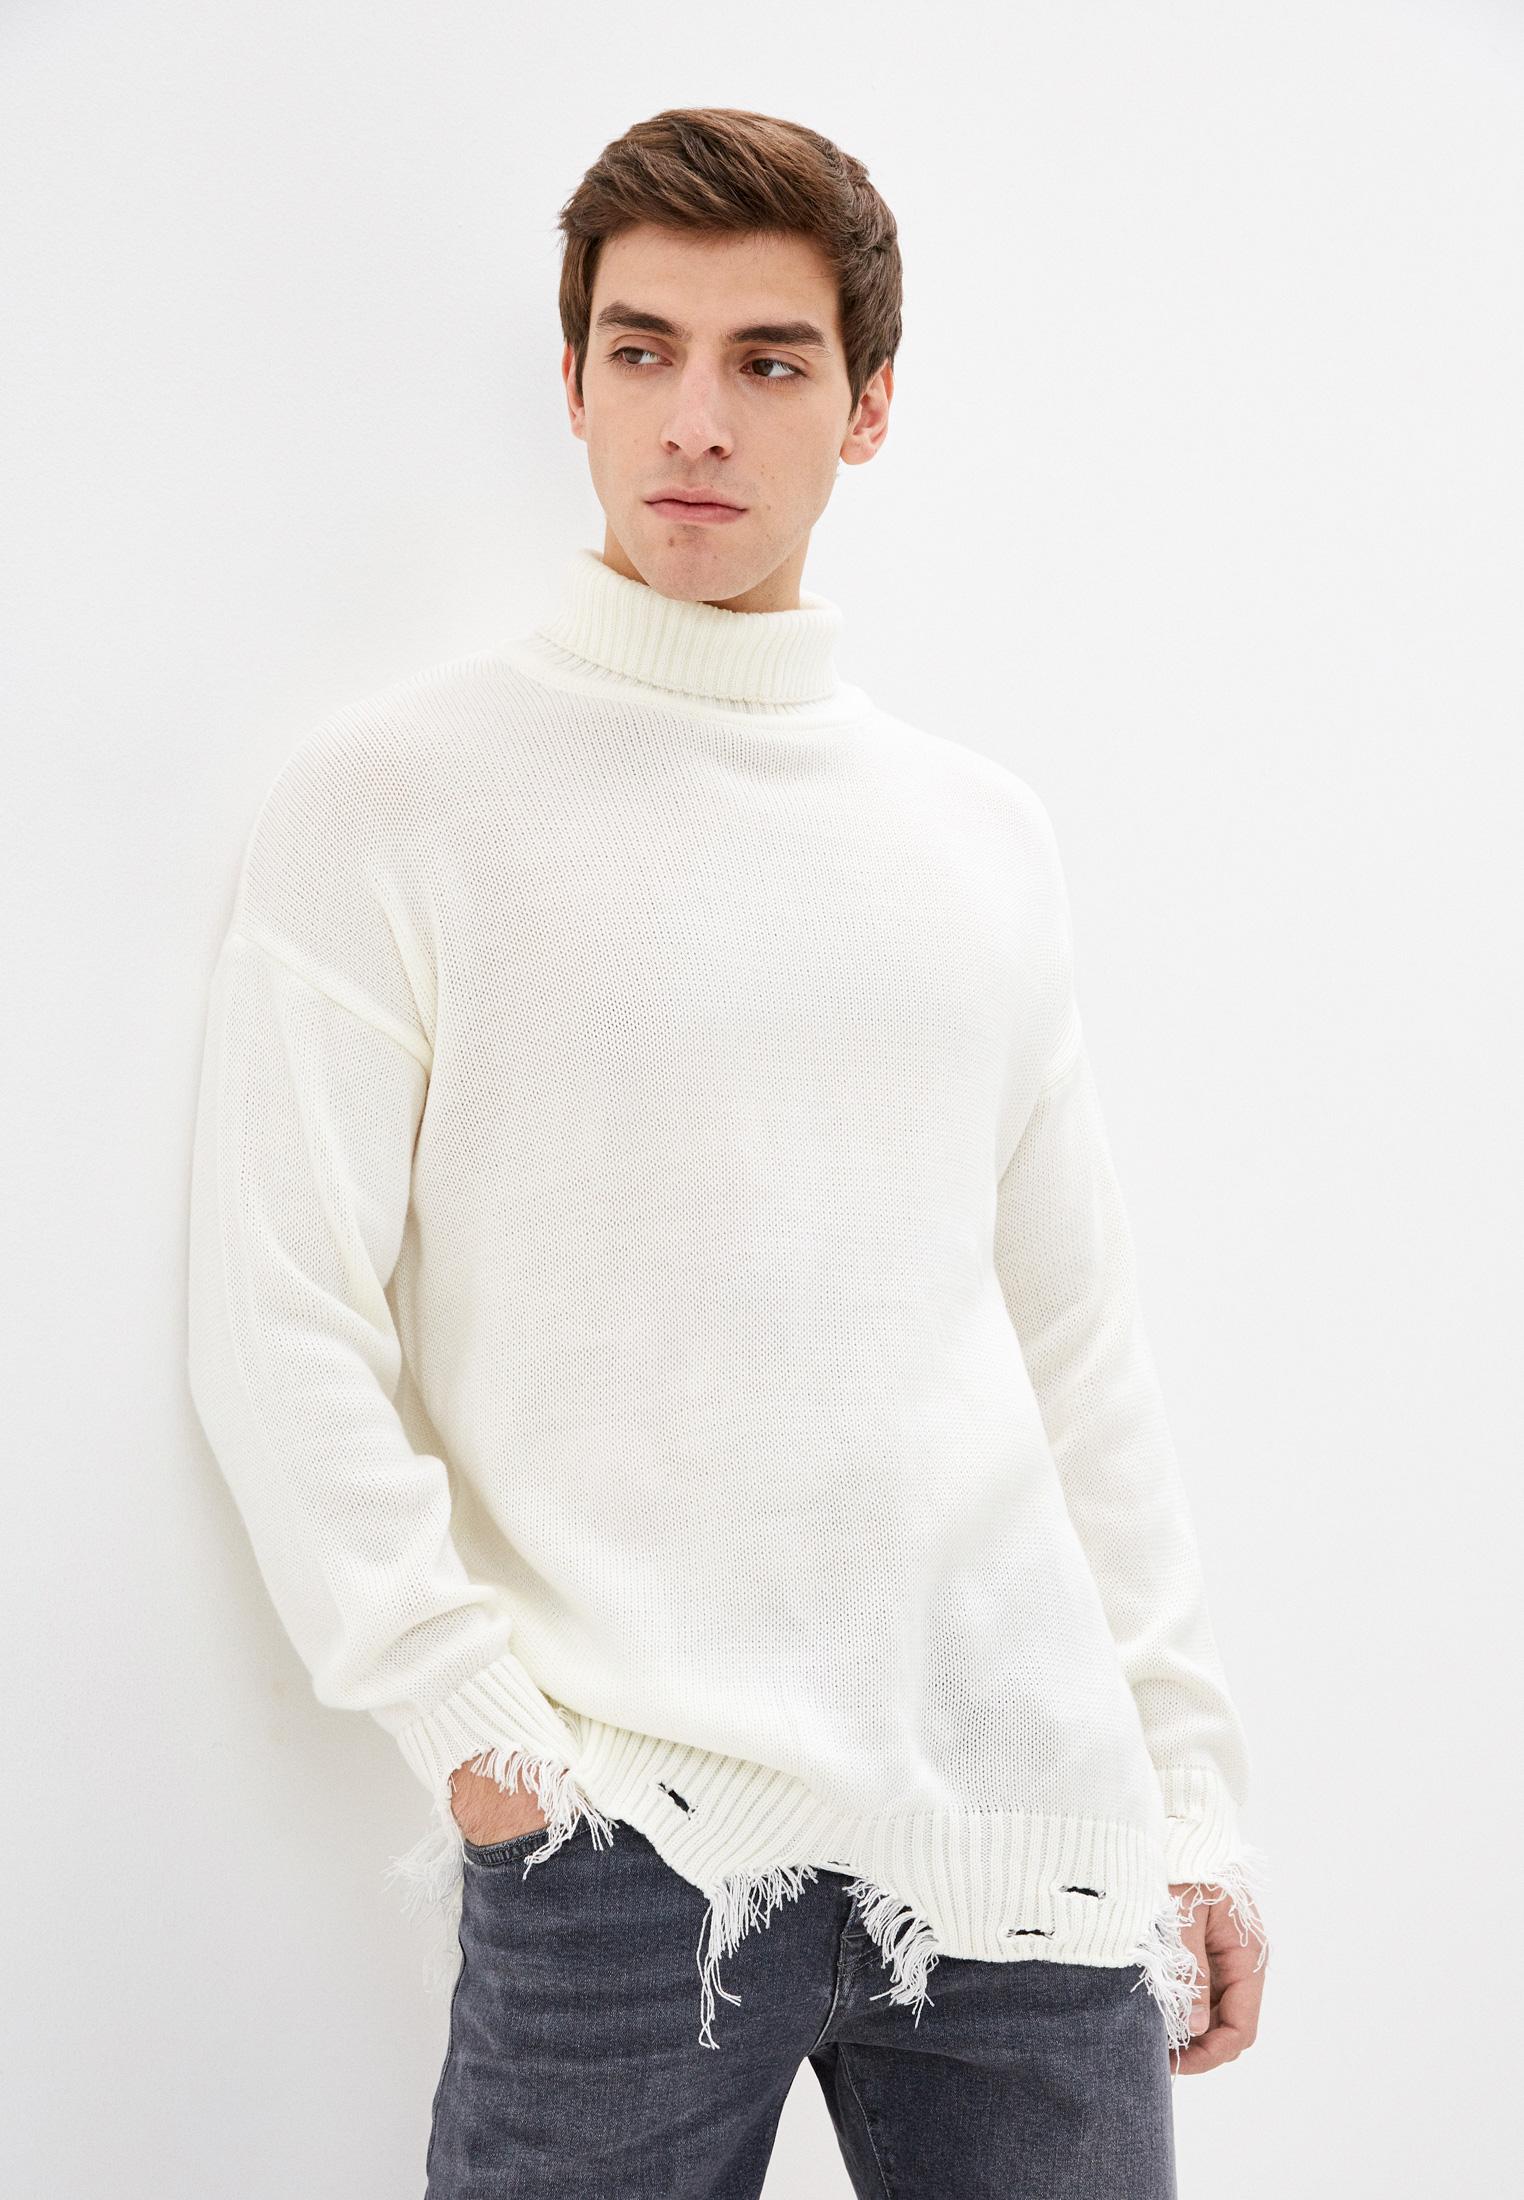 Мужская одежда Dali 2602